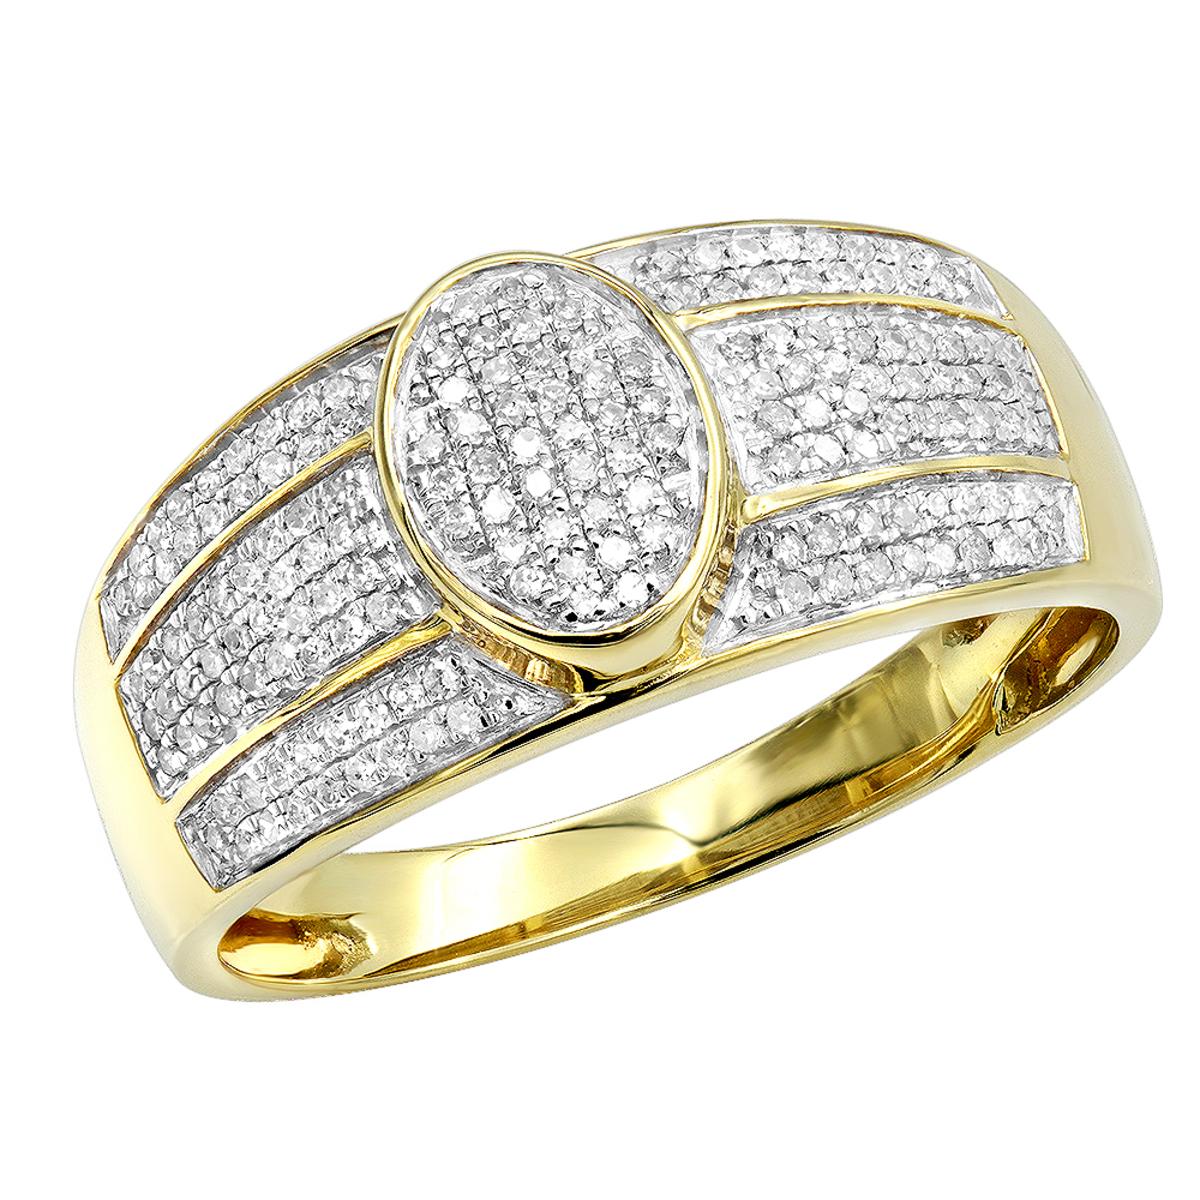 Affordable Mens Diamond Ring 10k Gold Pave Diamonds Band 0.33ct